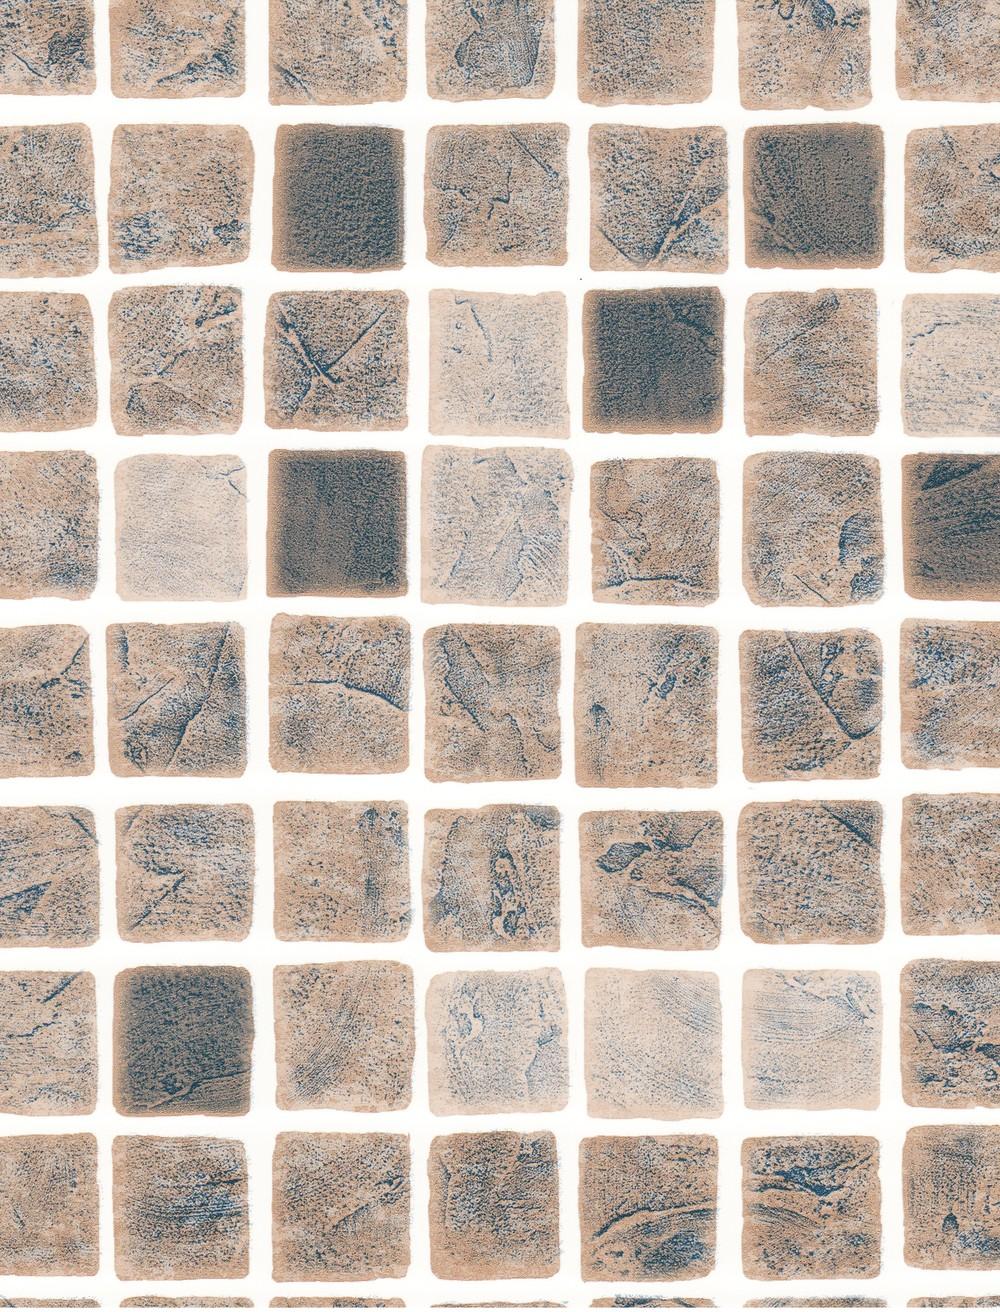 Persia Sand Mosaic.jpg